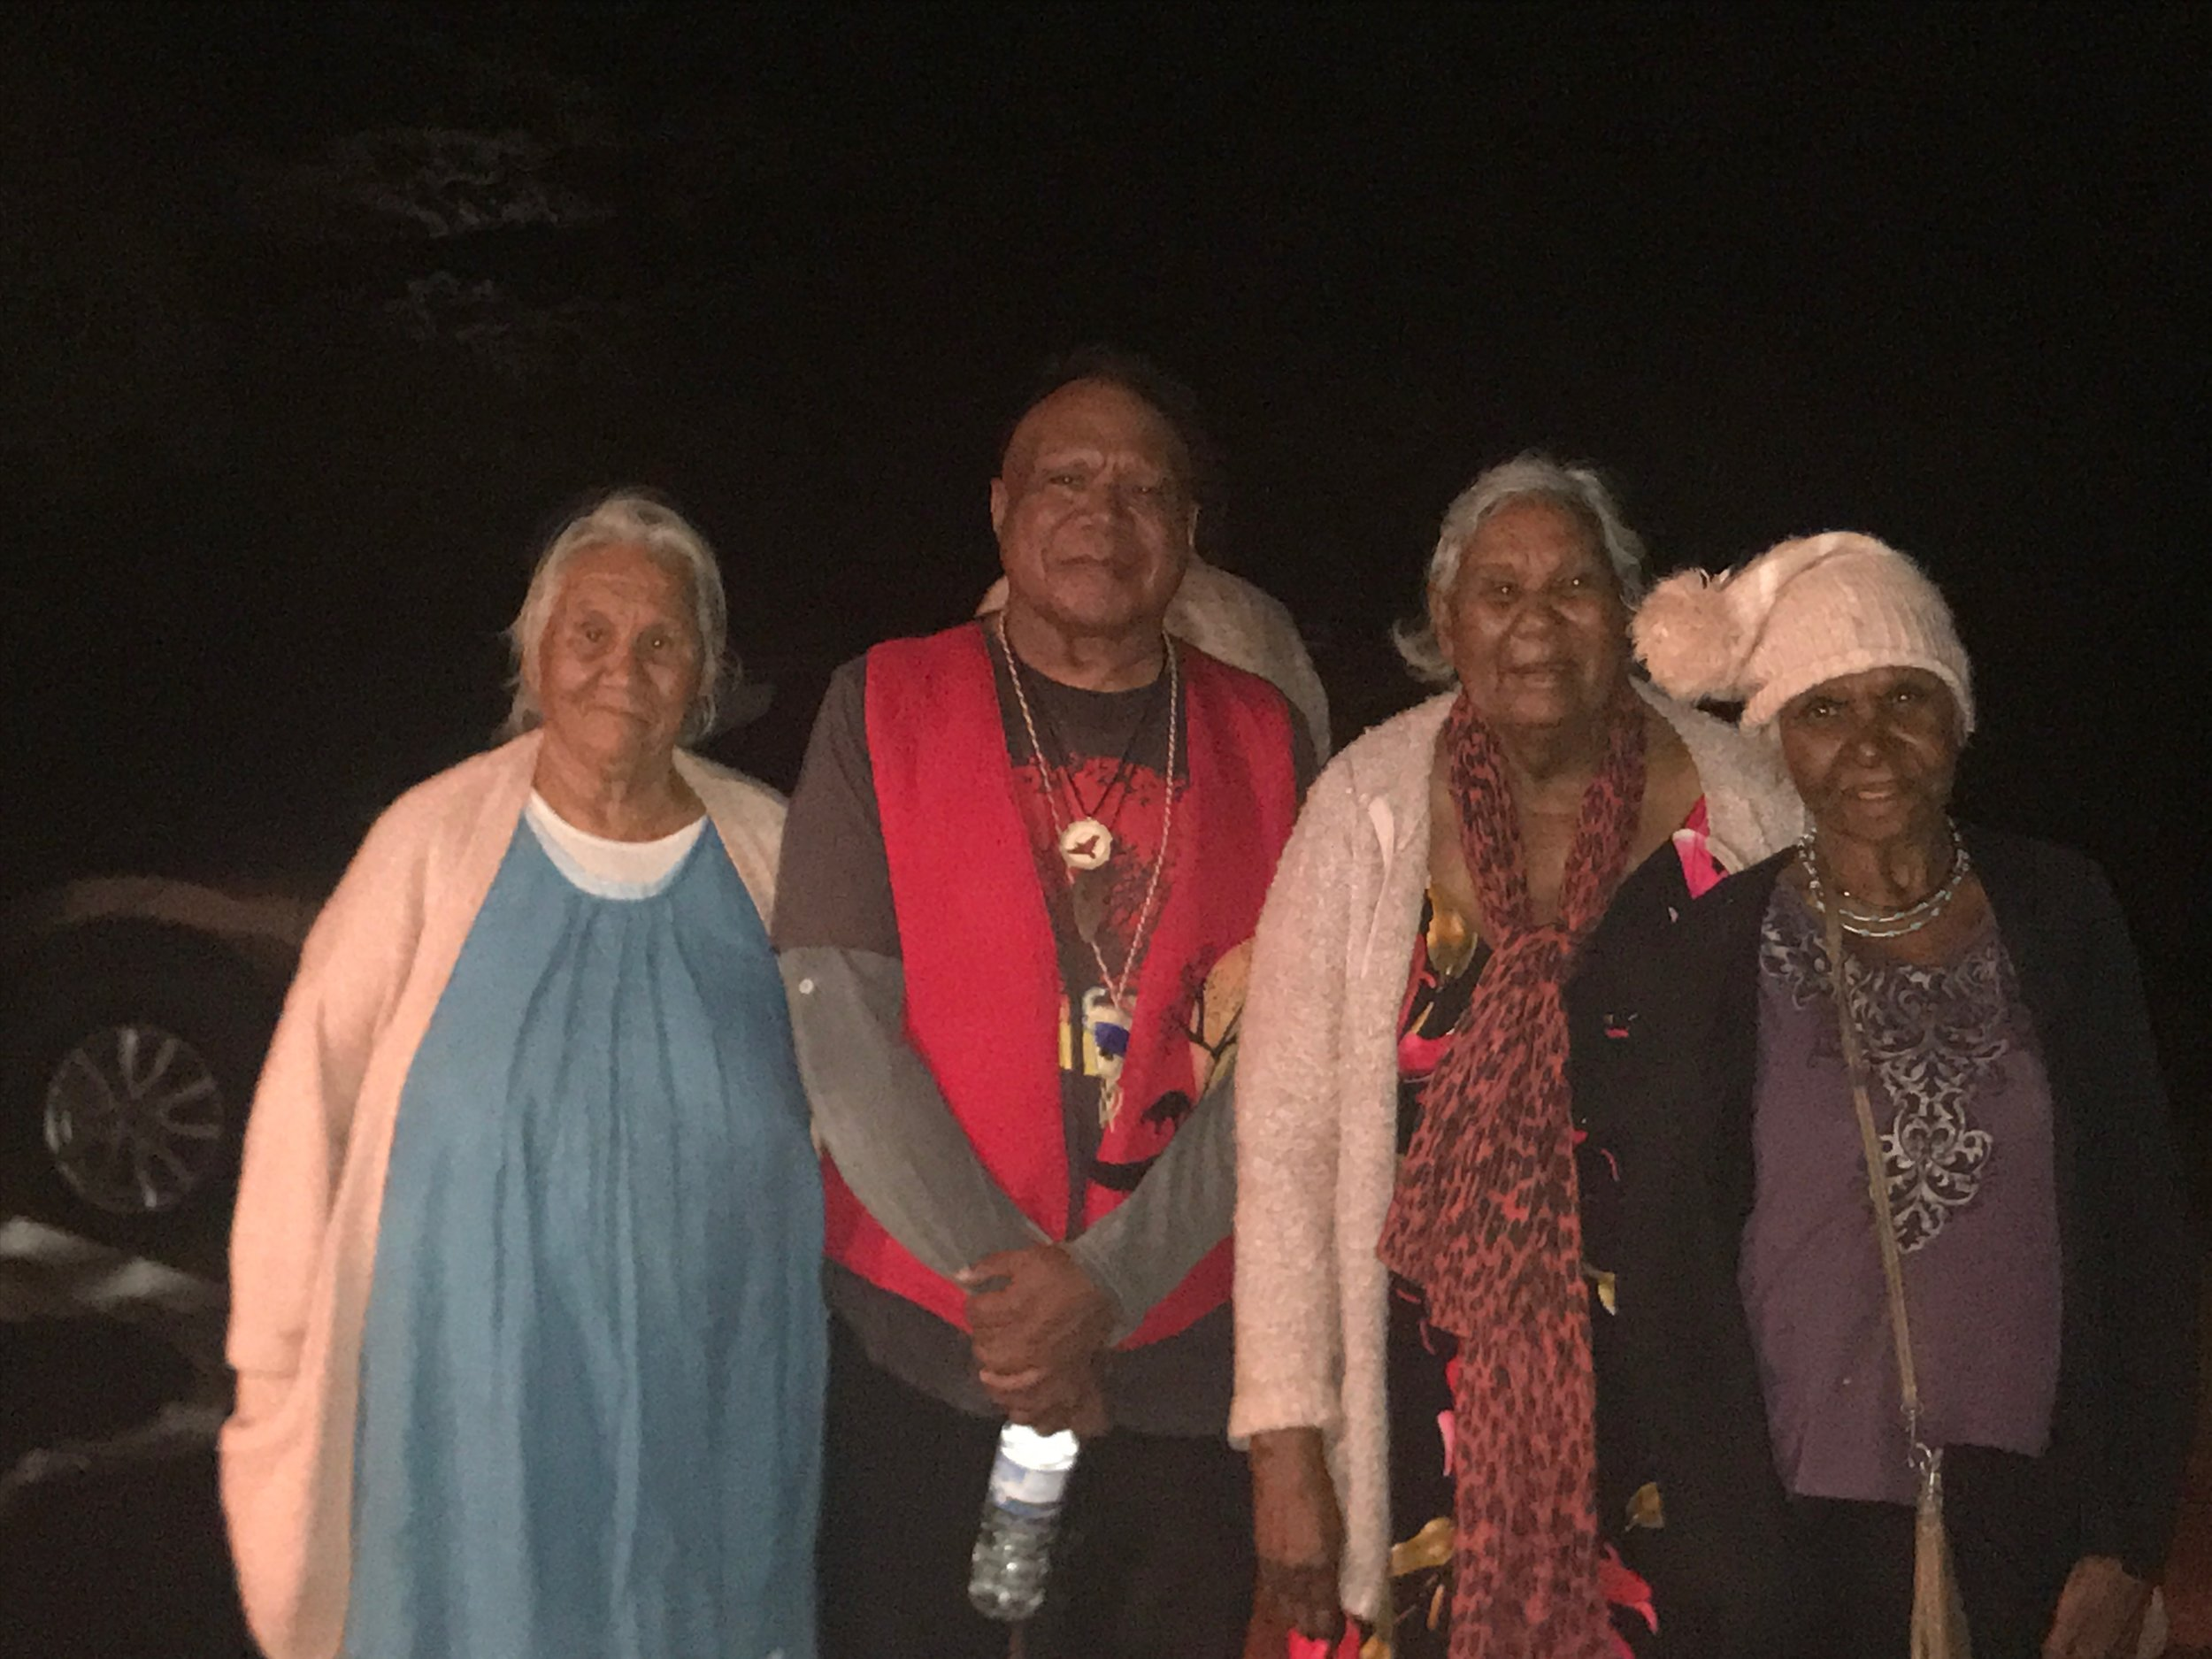 Archie meets community elders